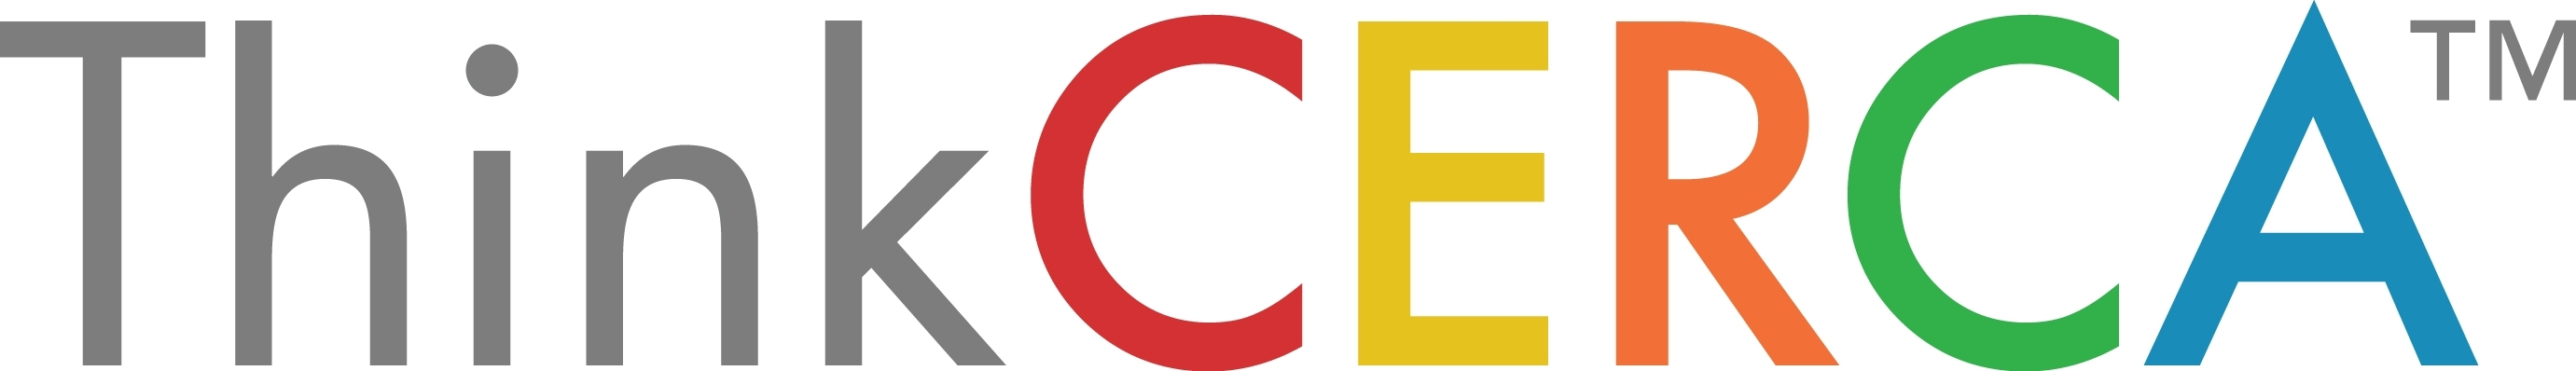 ThinkCERCA_Logo.jpg#asset:243